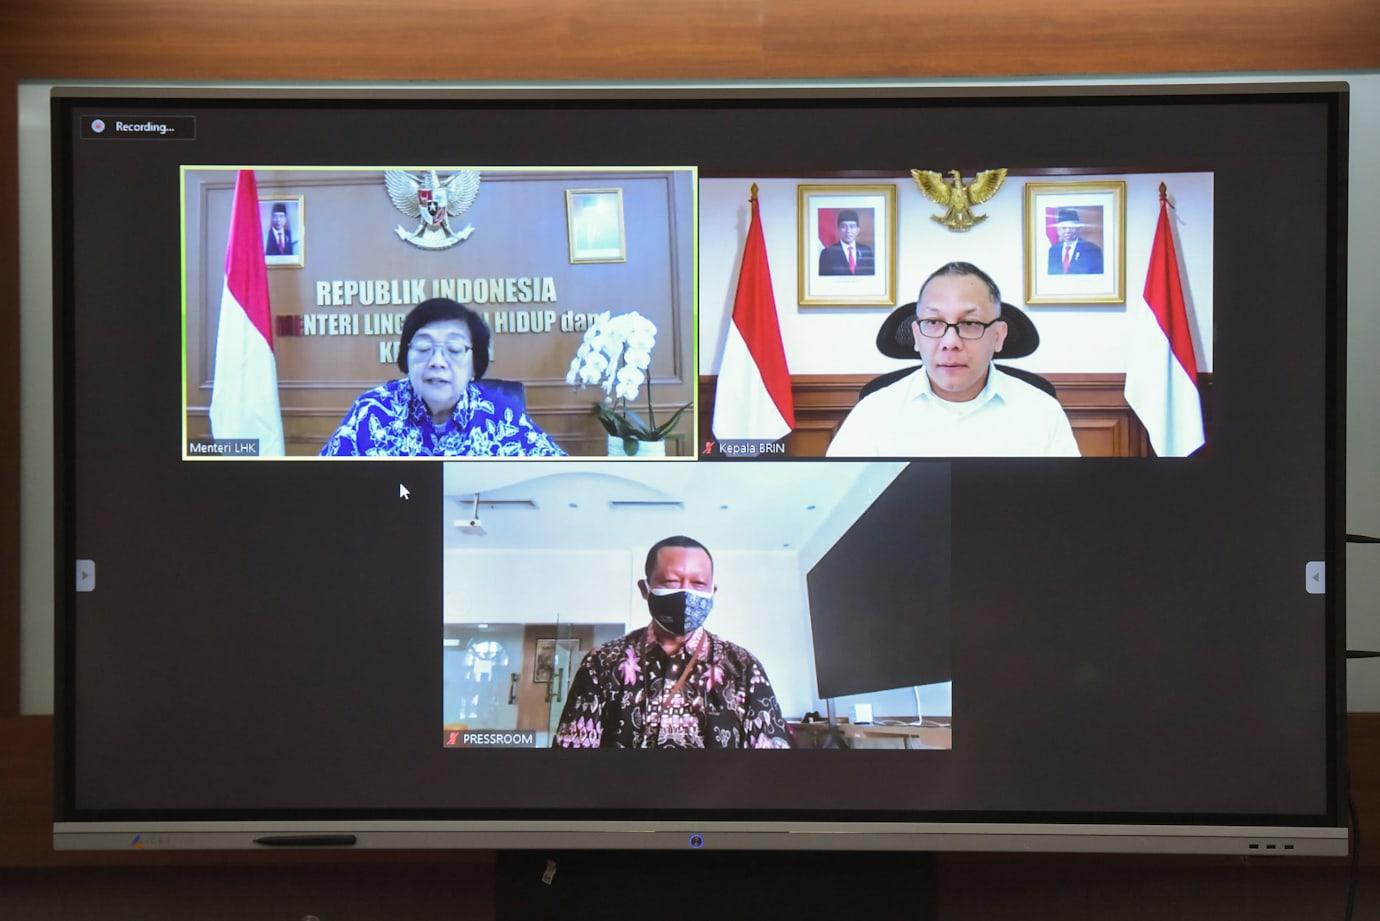 Menteri LHK Siti Nurbaya dan Kepala BRIN L.T. Handoko